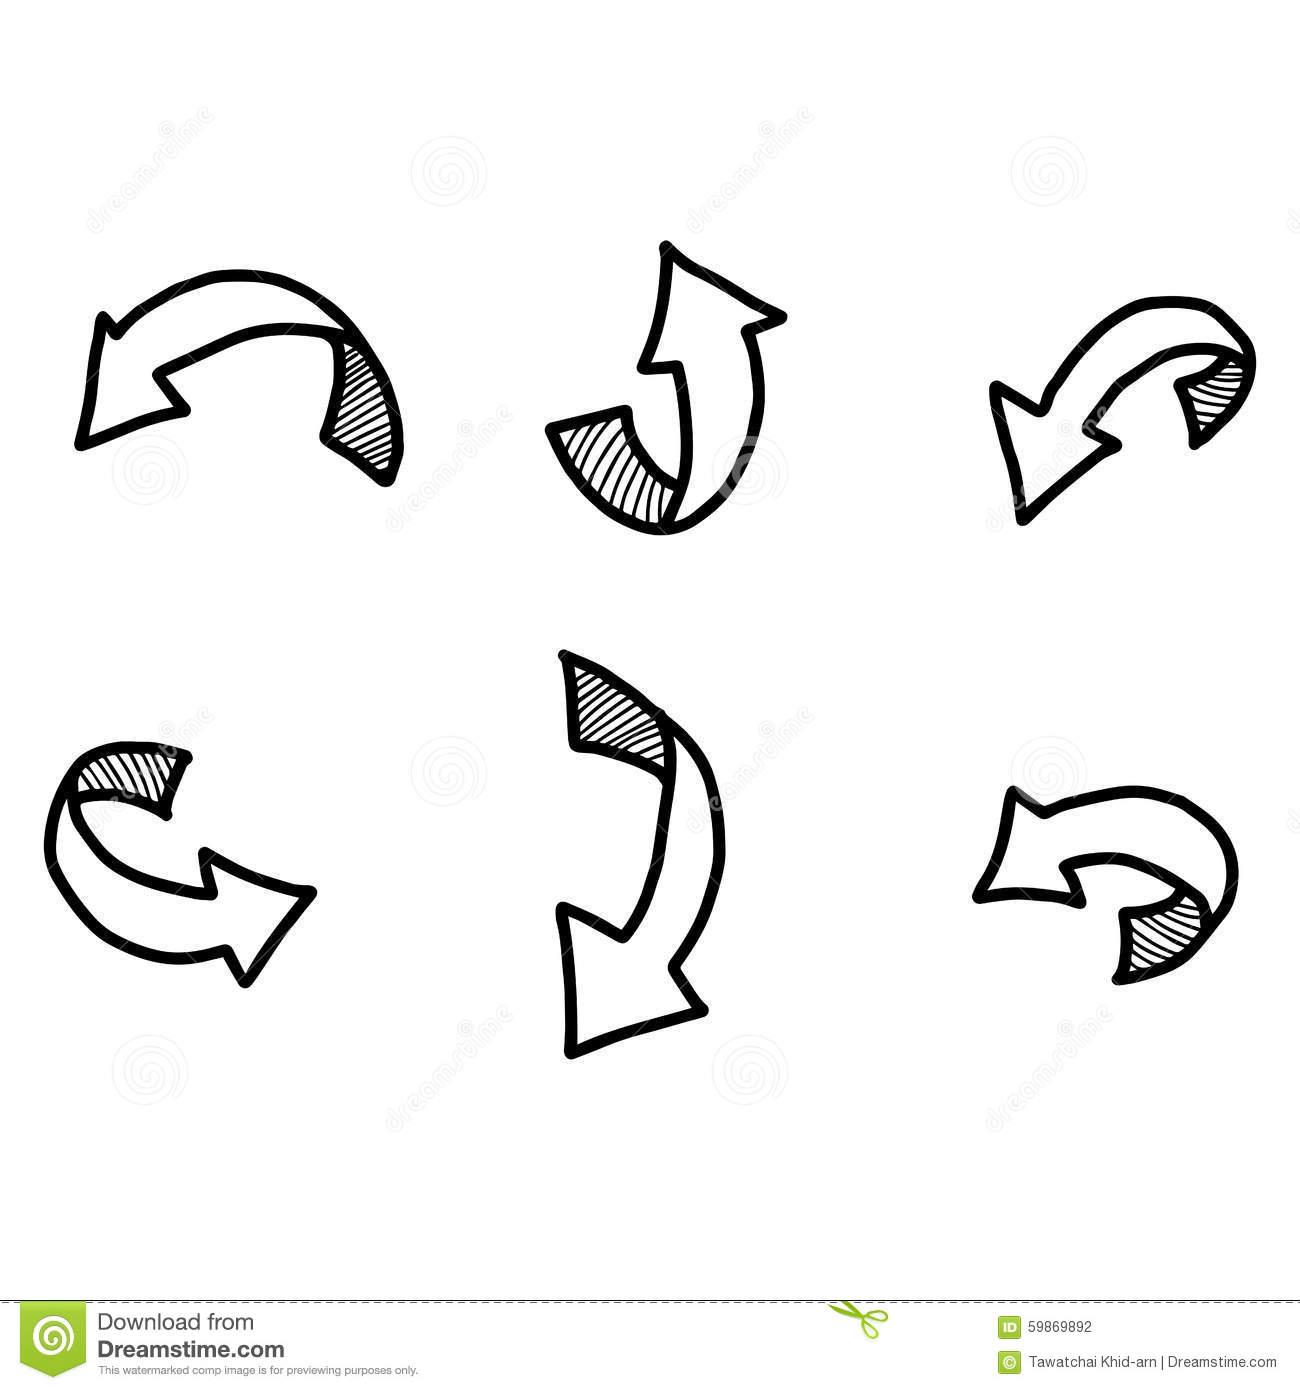 Doodle arrow clipart curved download Doodle arrow clipart curved - ClipartFest download